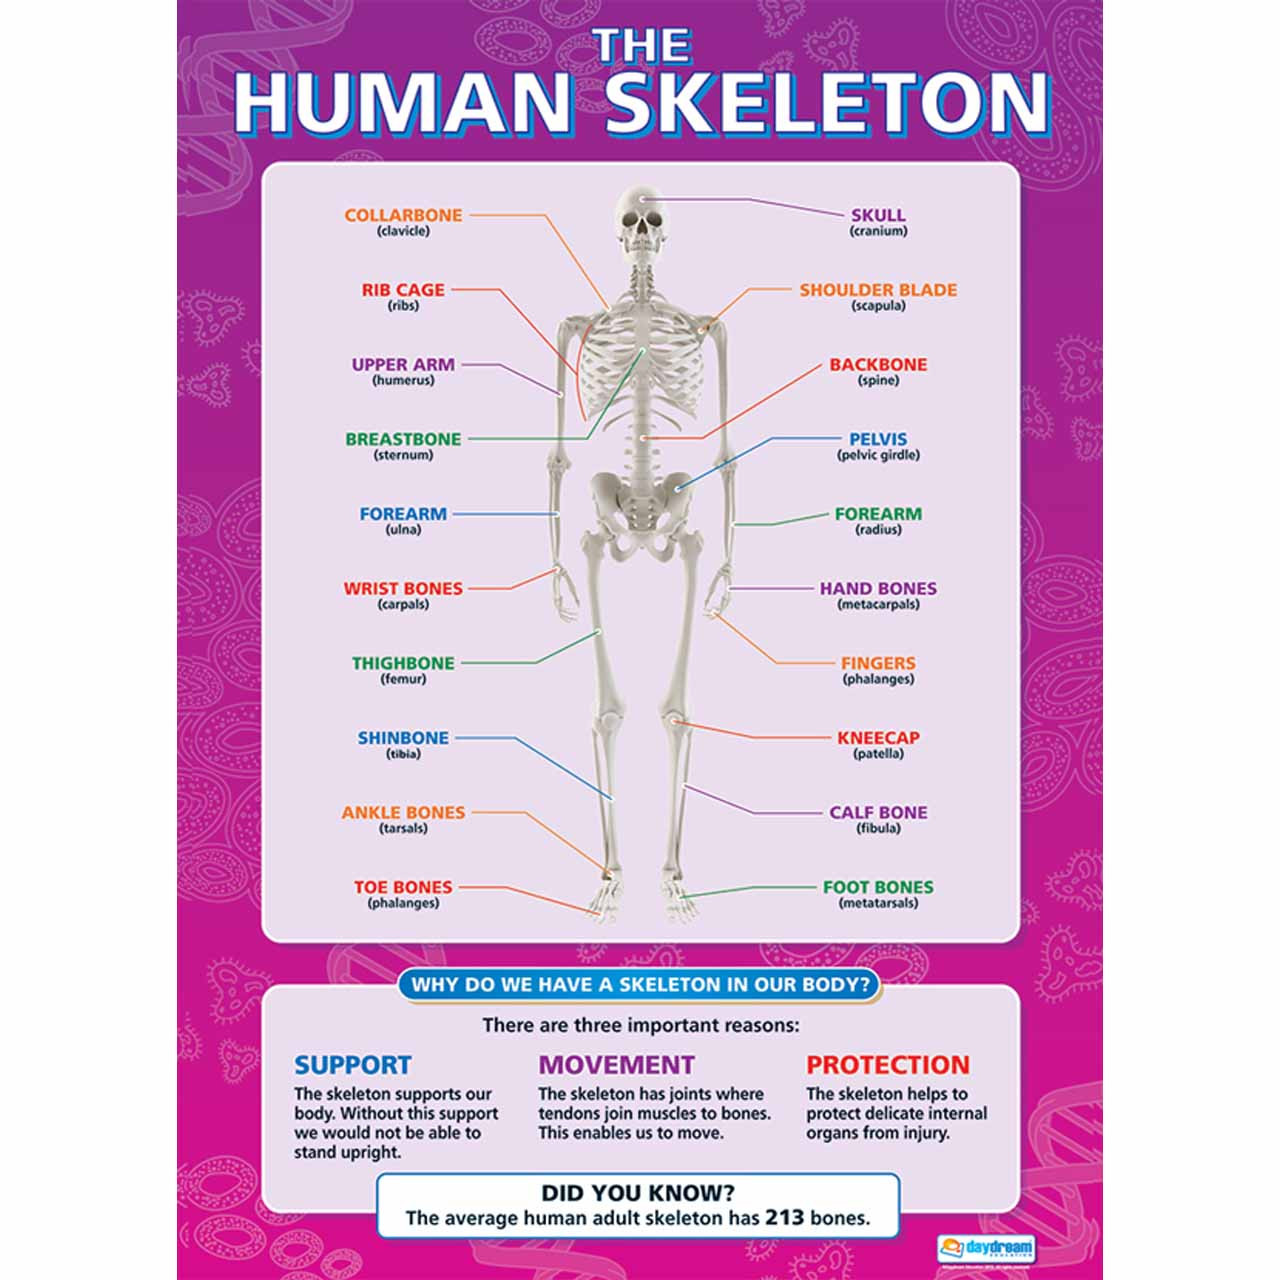 SC010L - The Human Skeleton Laminated